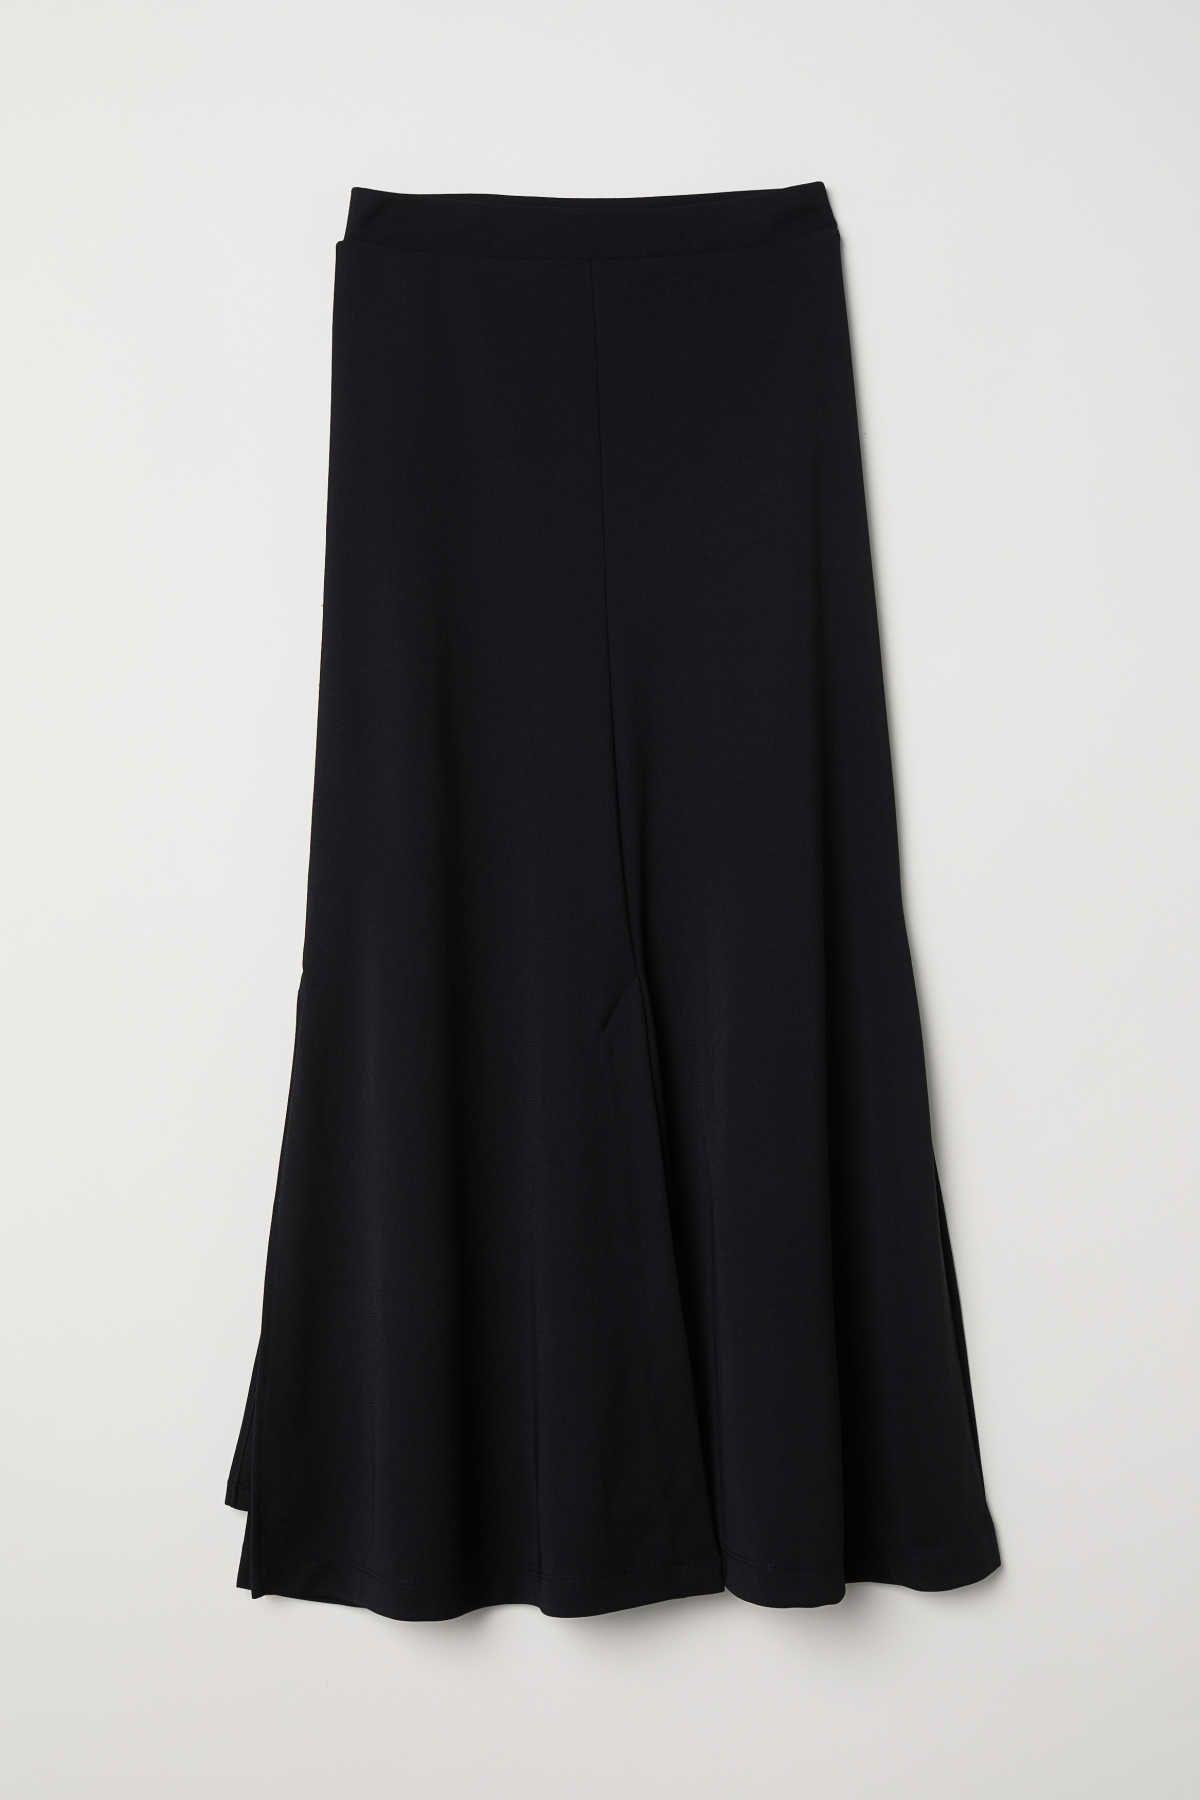 ee6e822e97 Calf-length skirt | Black | LADIES | H&M AU | Wish List - H&M | Calf ...